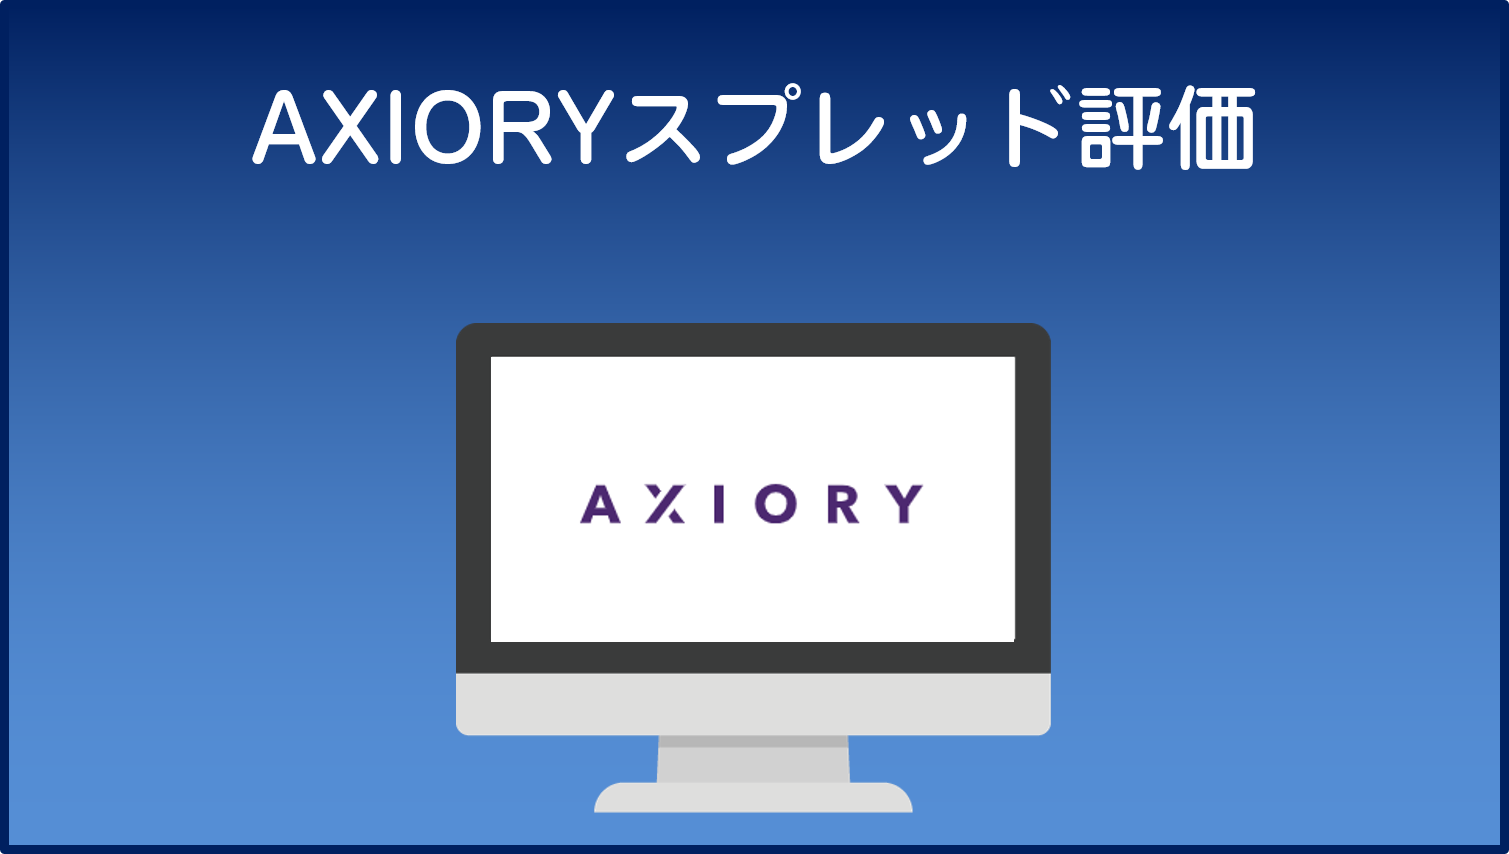 AXIORYスプレッド評価